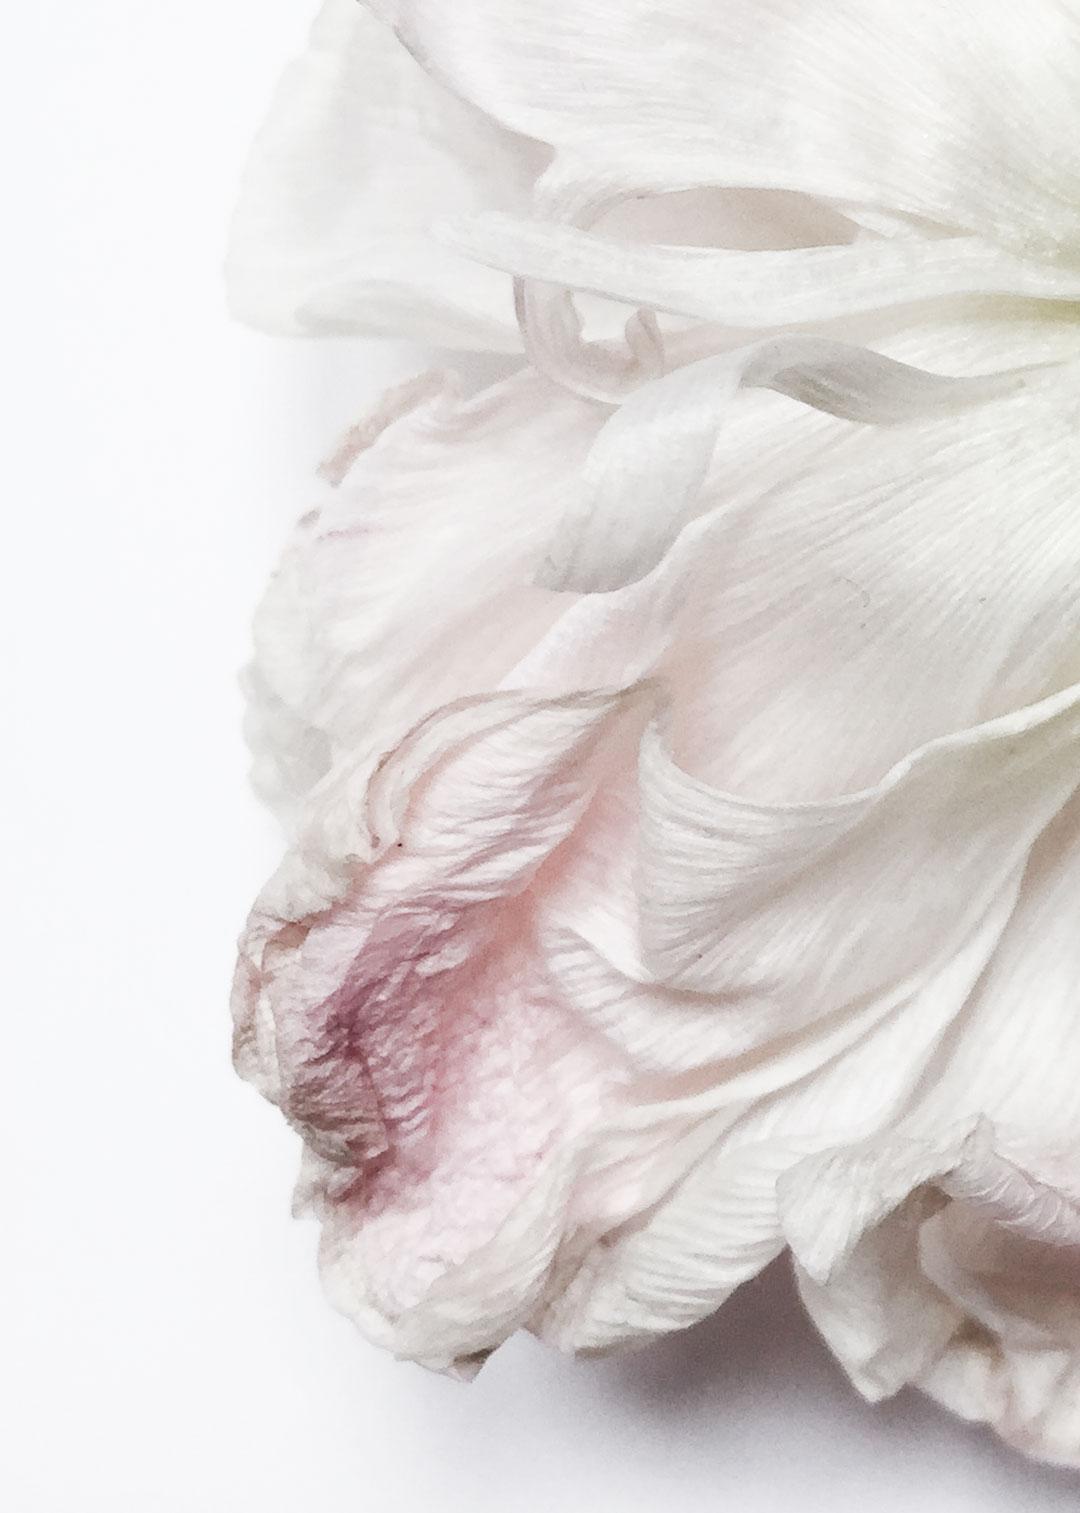 Insta_flower_study_3